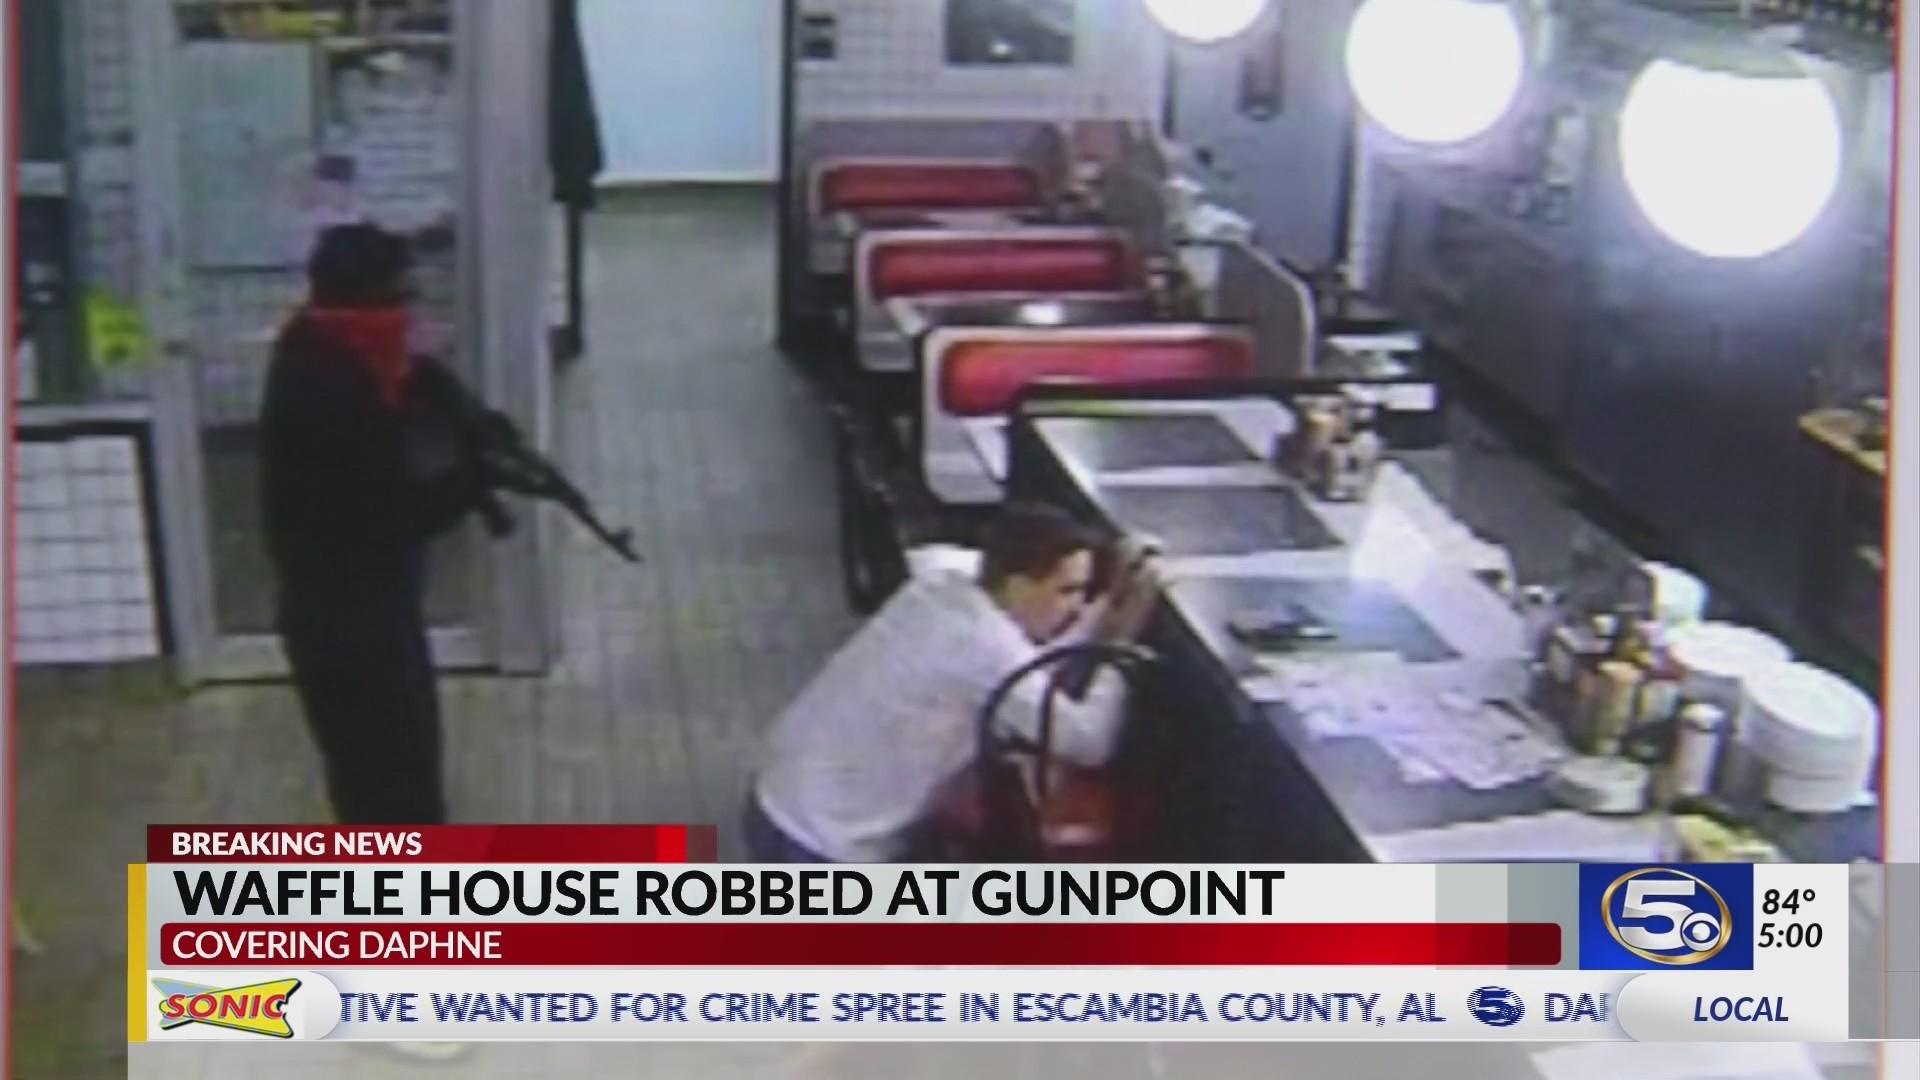 Daphne Waffle House armed robbery